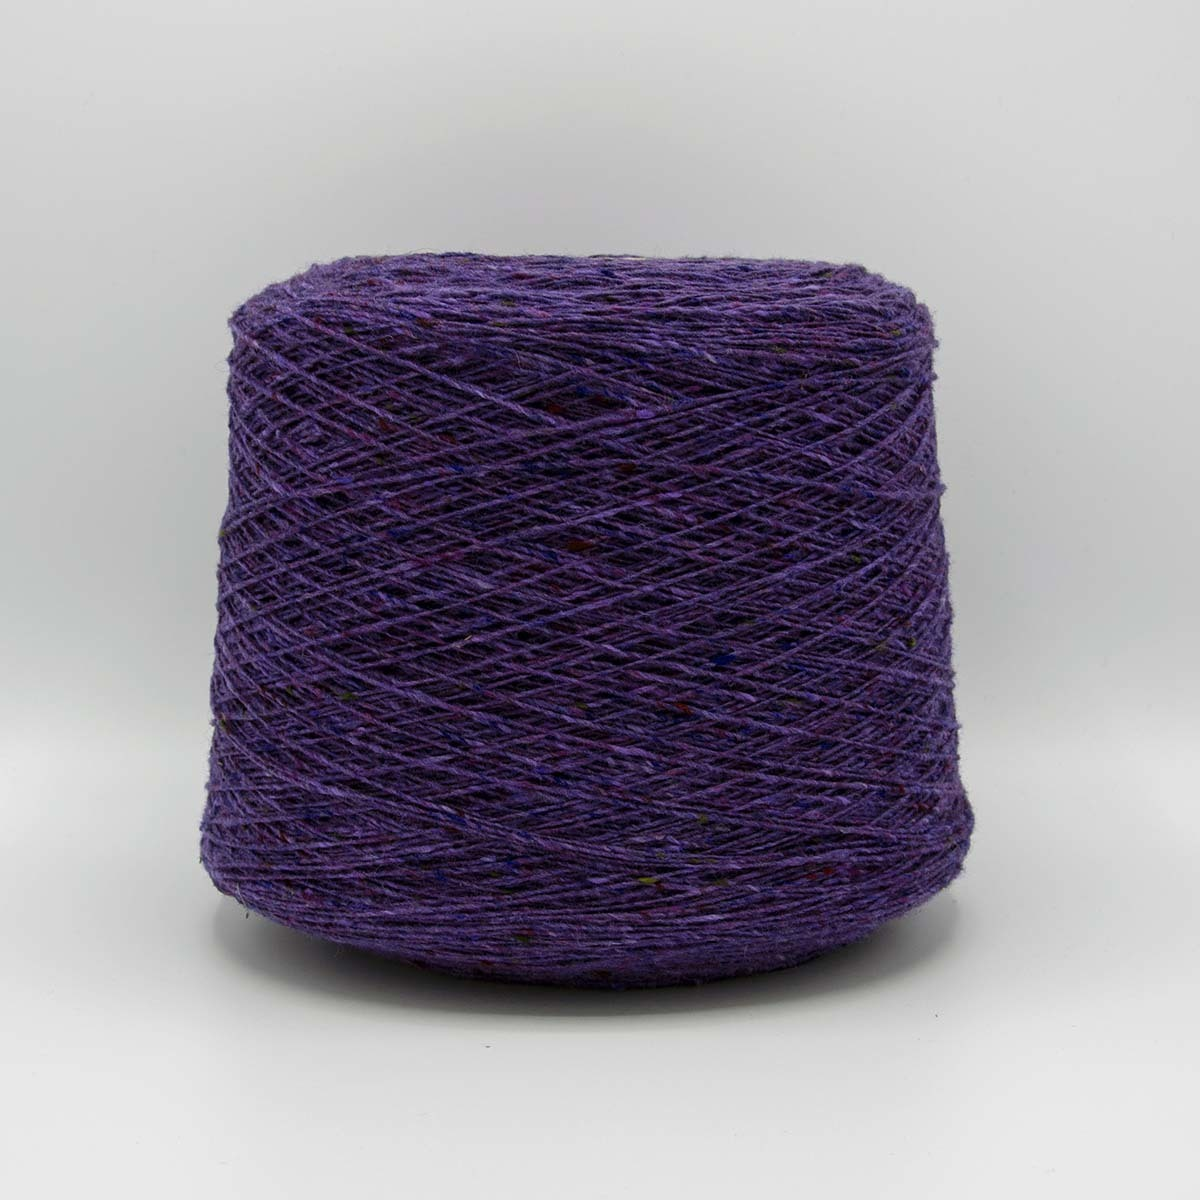 Knoll Yarns Soft Donegal (одинарный твид) - 5532